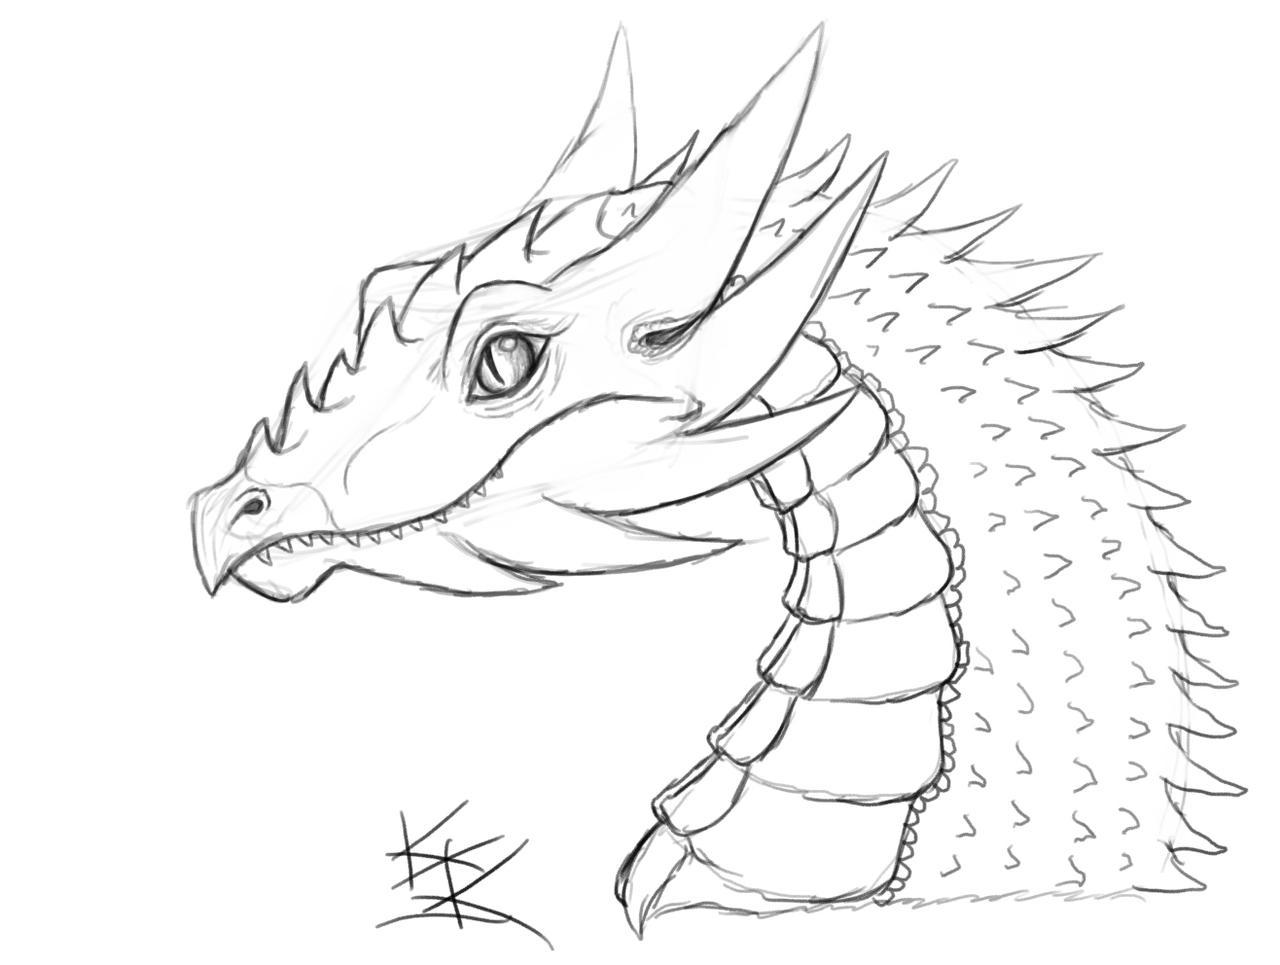 Dragon Sketch by Techdrakonic on DeviantArt